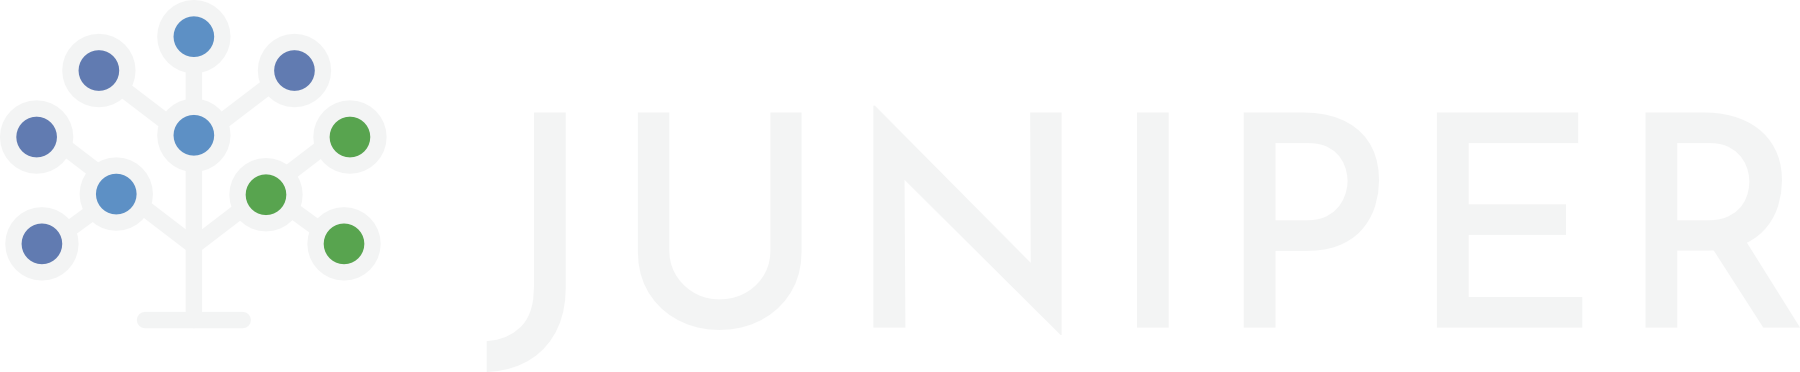 juniper site logo